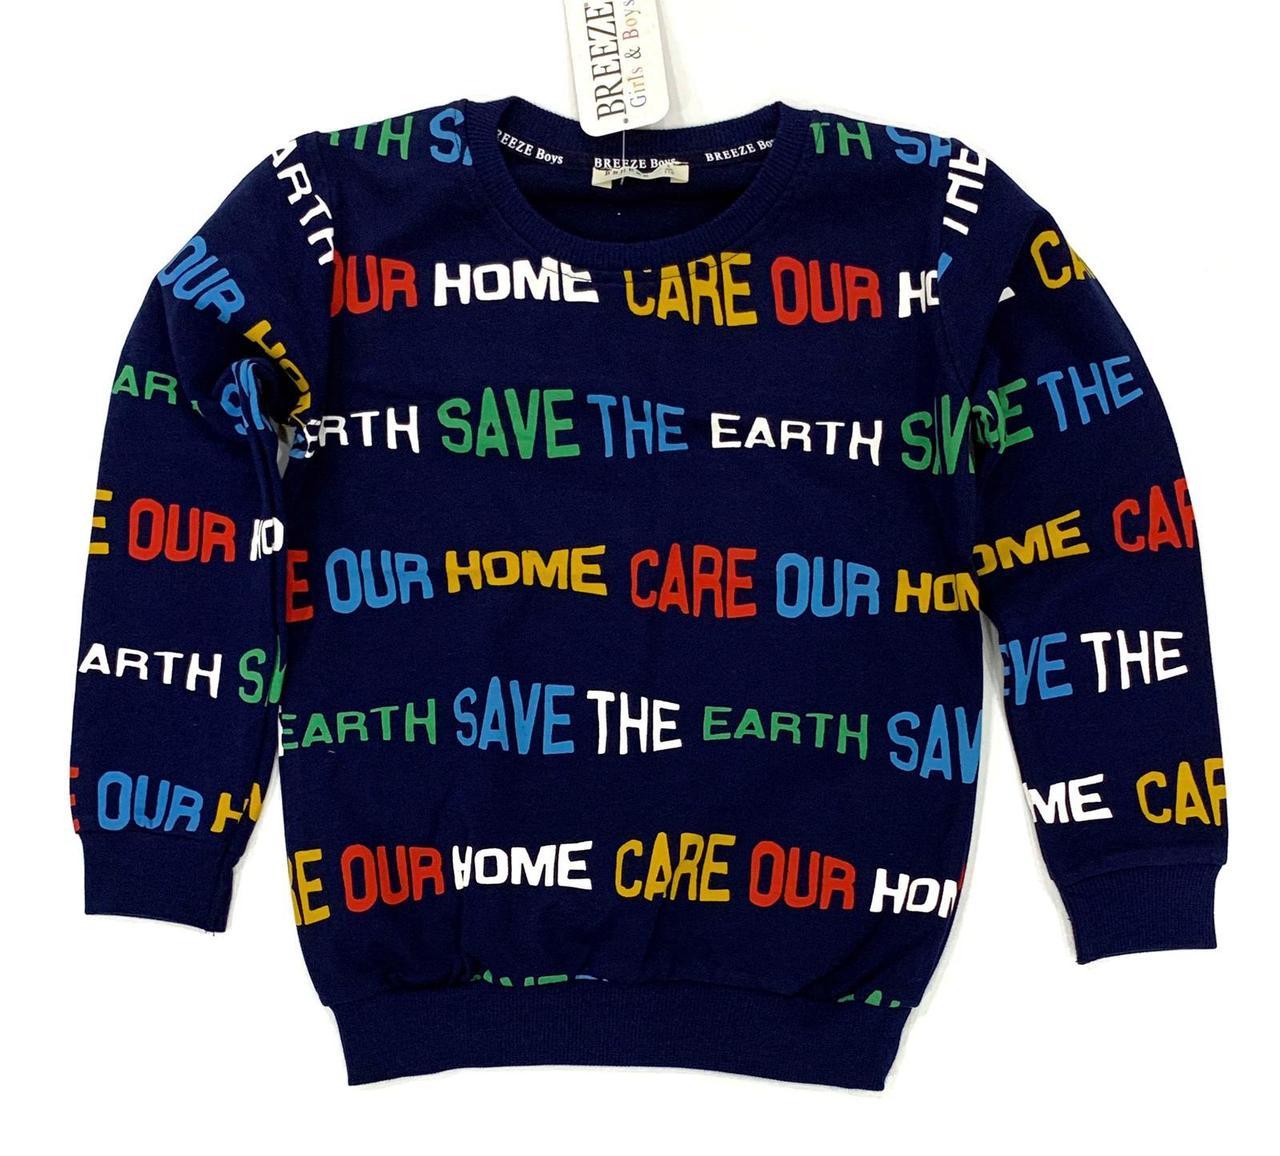 №16004 Свитшот Save the planet син цв.110-140 см 14042